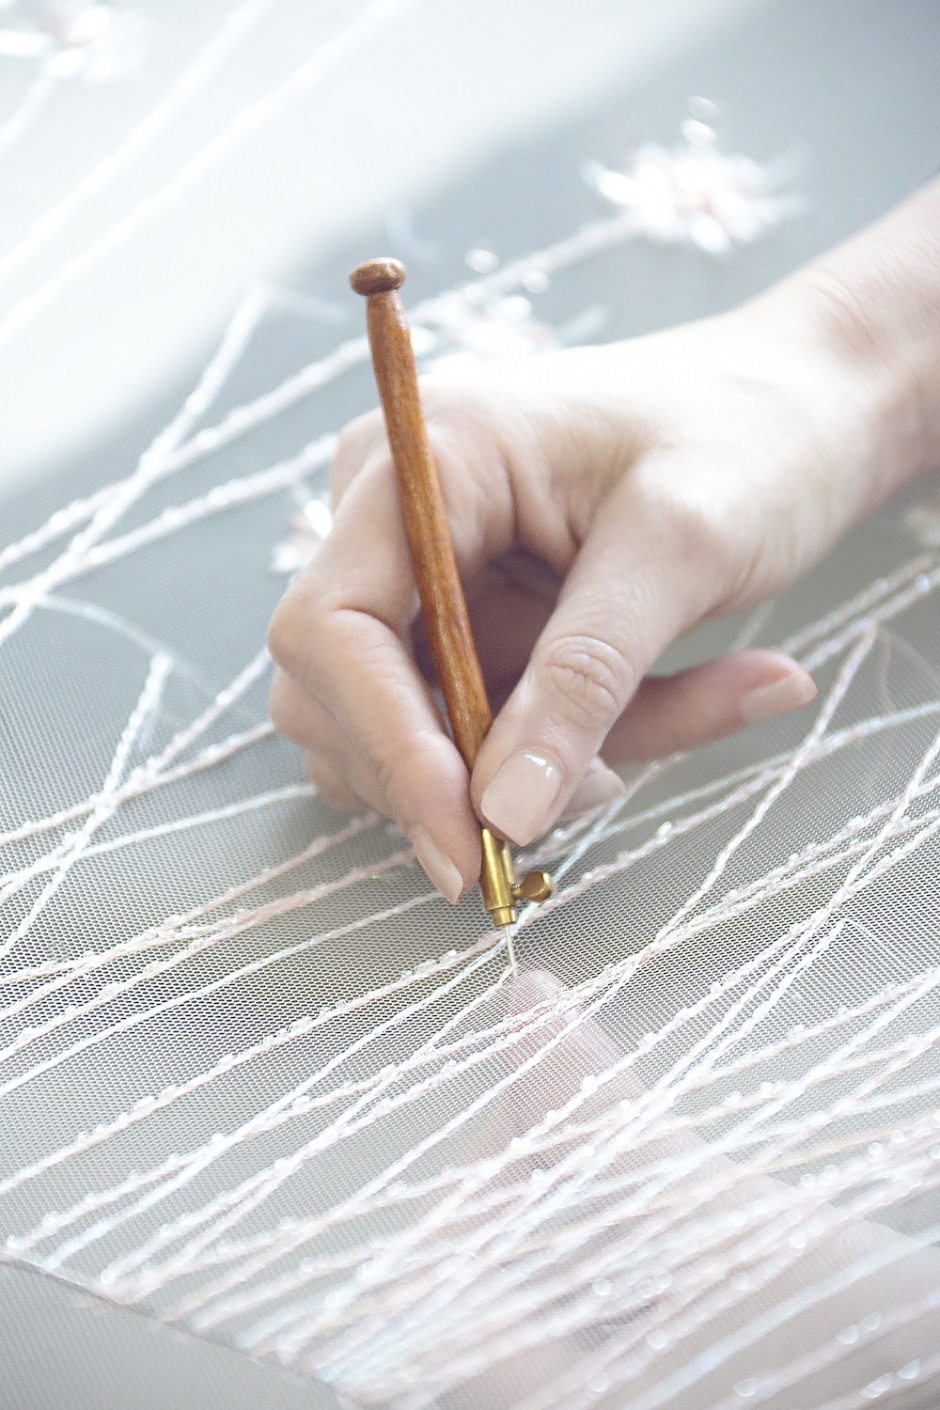 Desrues Couture Atelier